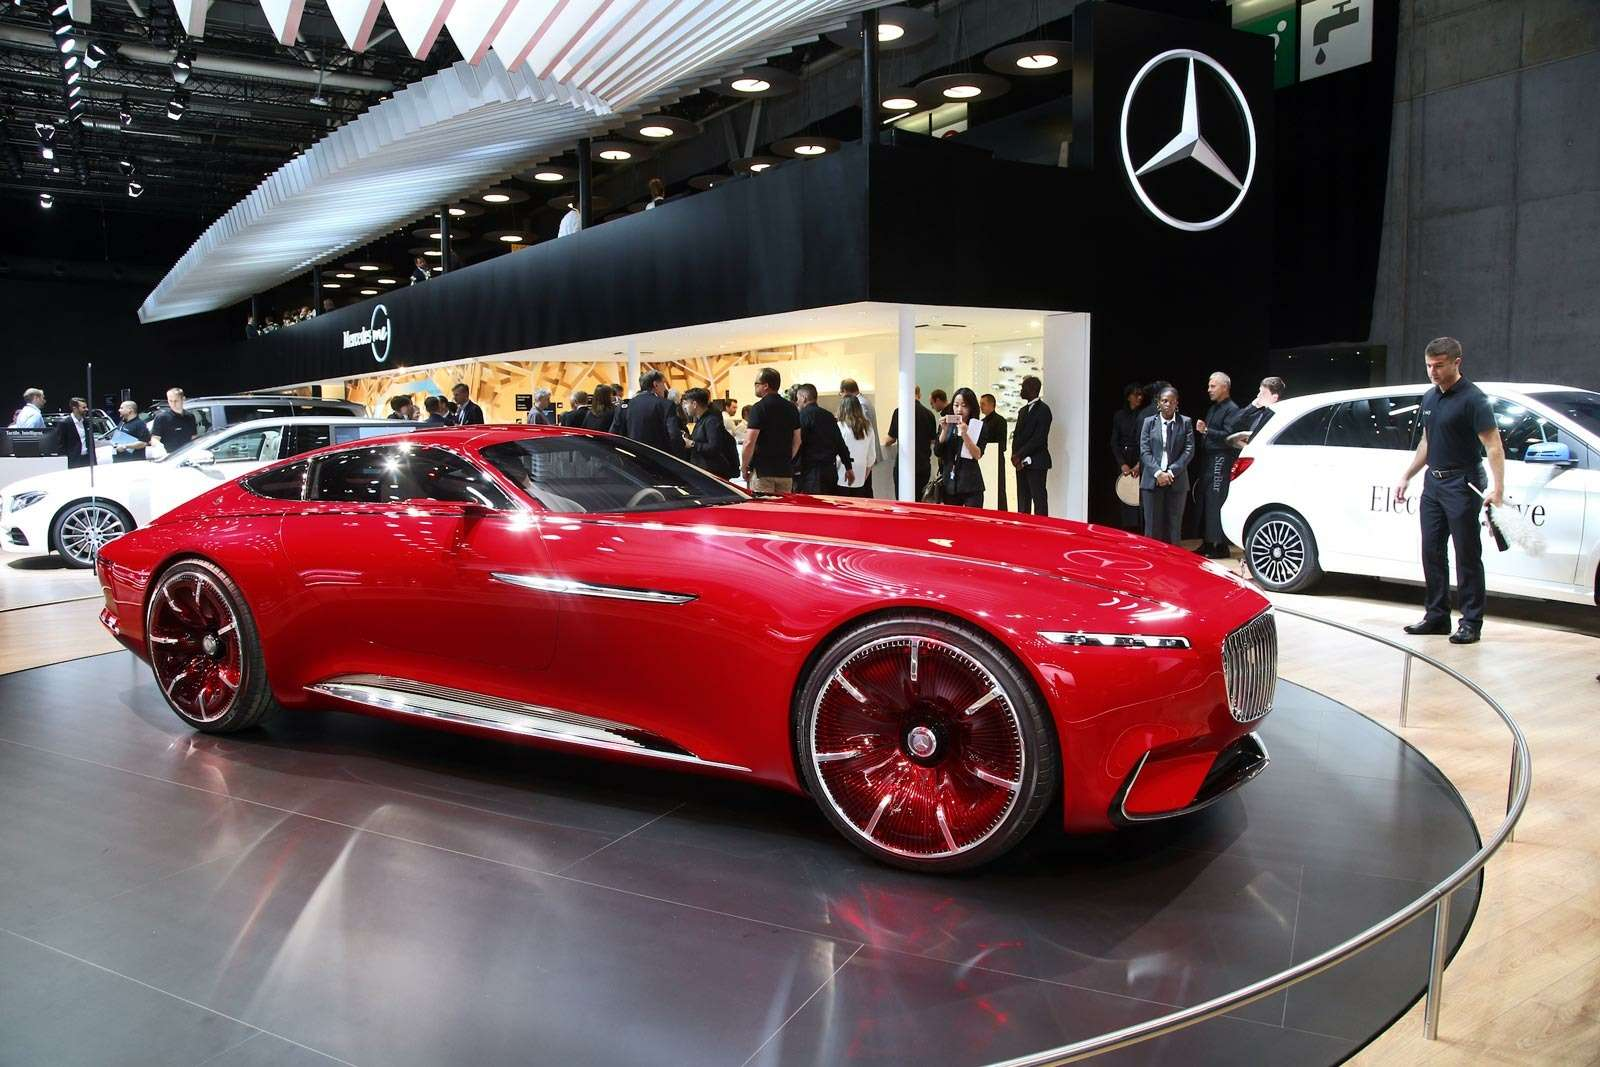 Самый красивый автомобиль Парижа: Vision Mercedes-Maybach 6завоевывает сердца— фото 643567